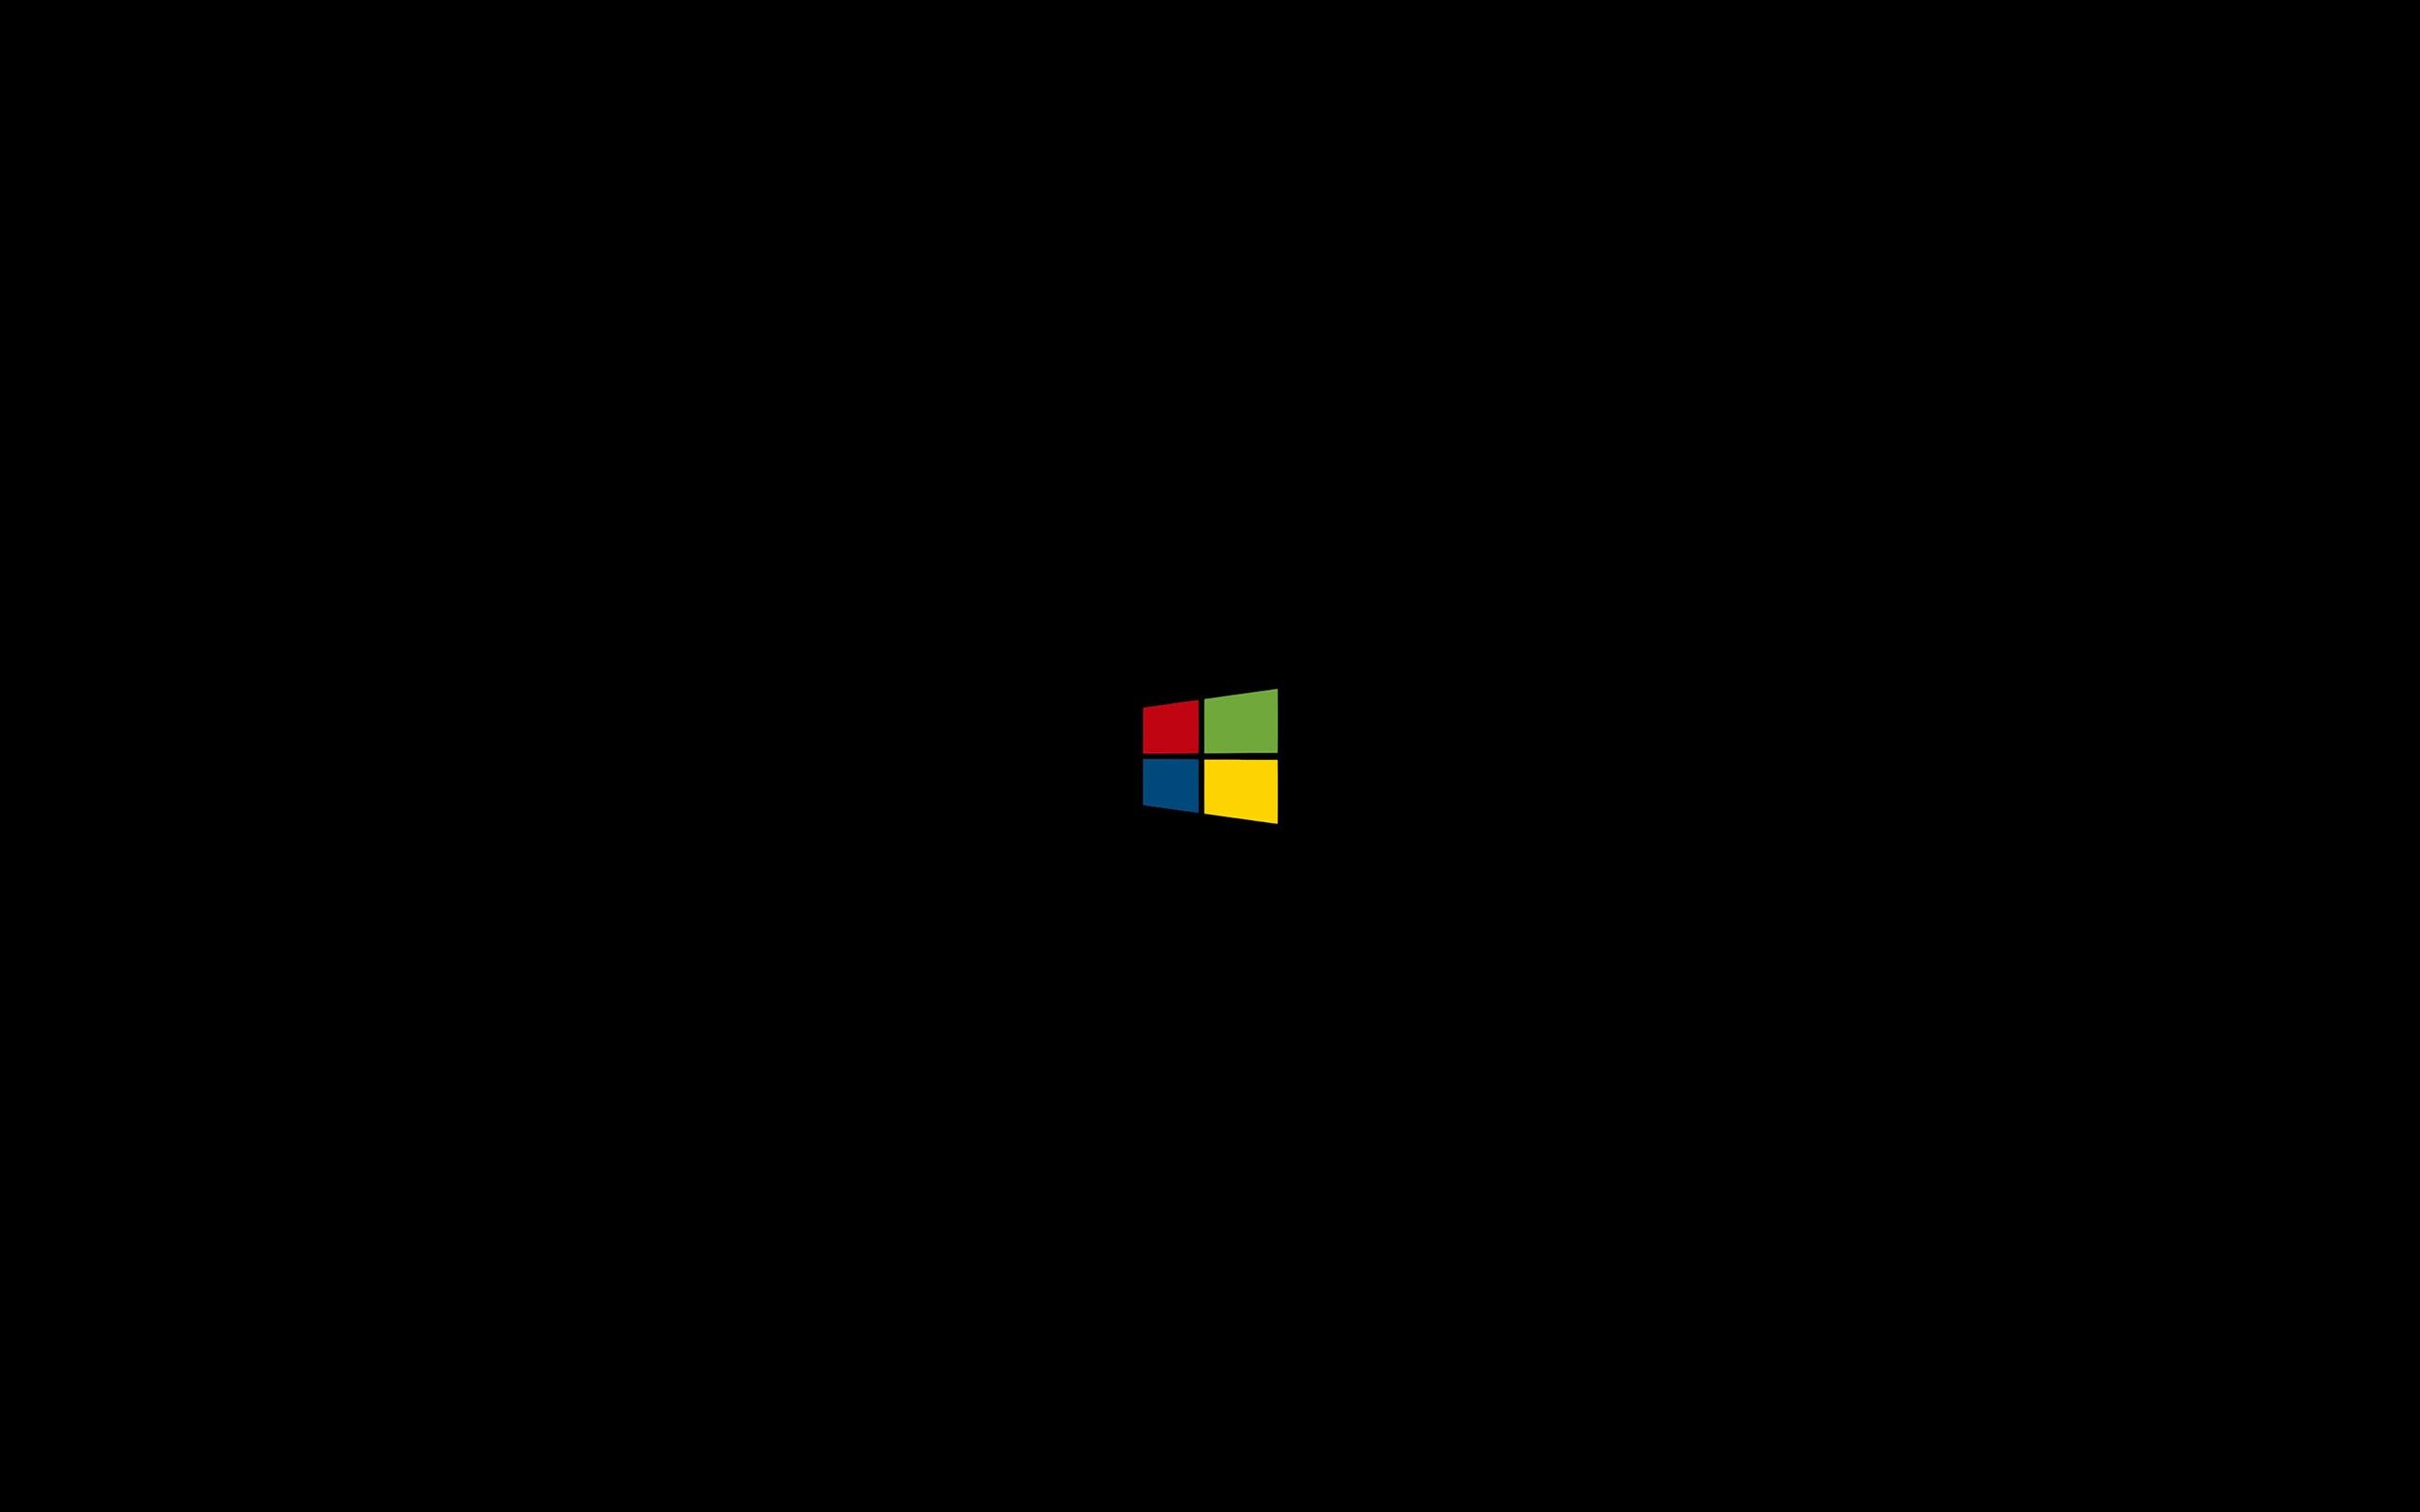 Masaüstü Basit Arka Plan Minimalizm Logo Lens Parlaması